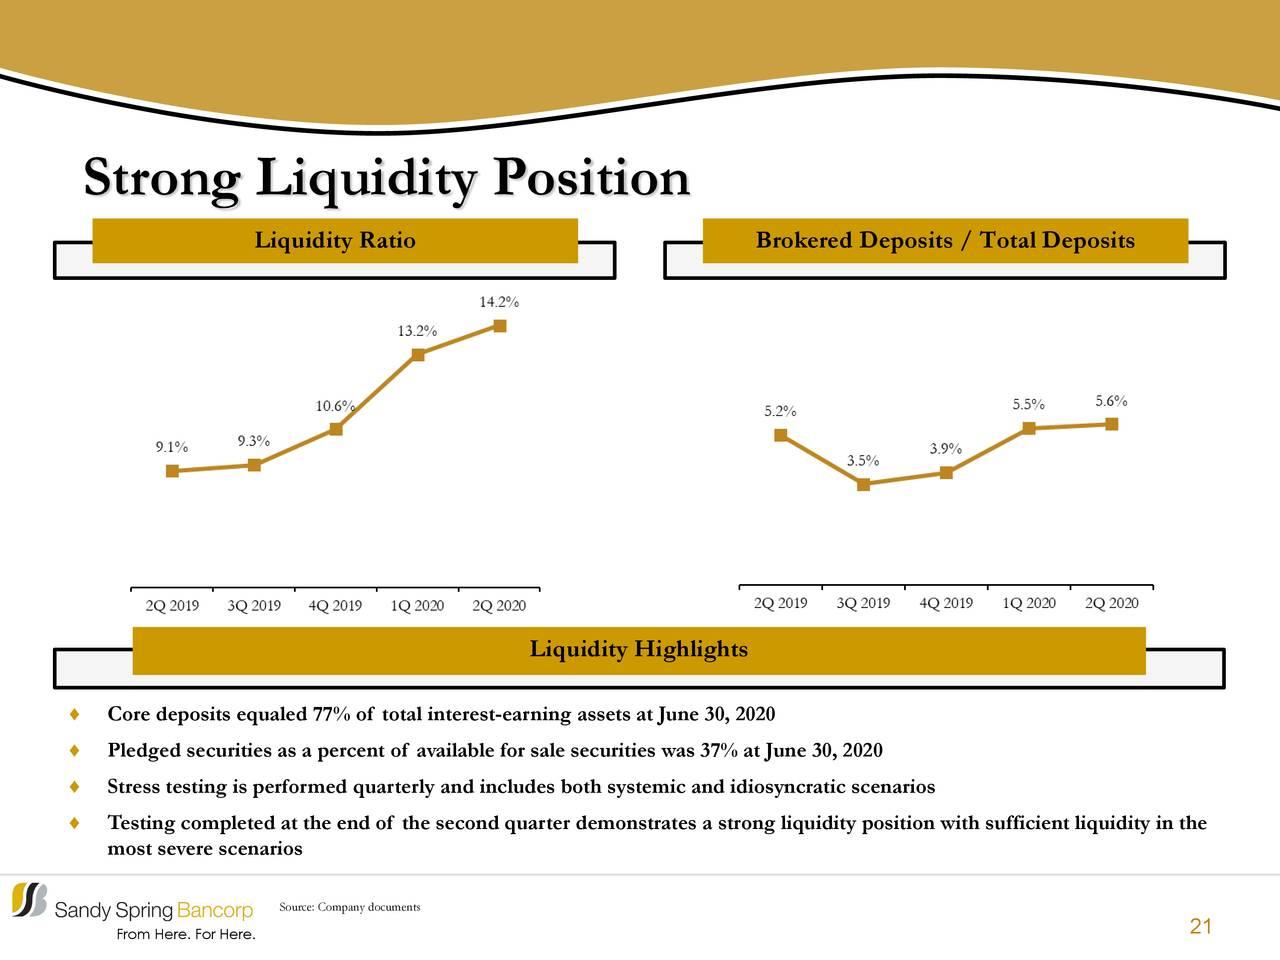 Fuerte posición de liquidez